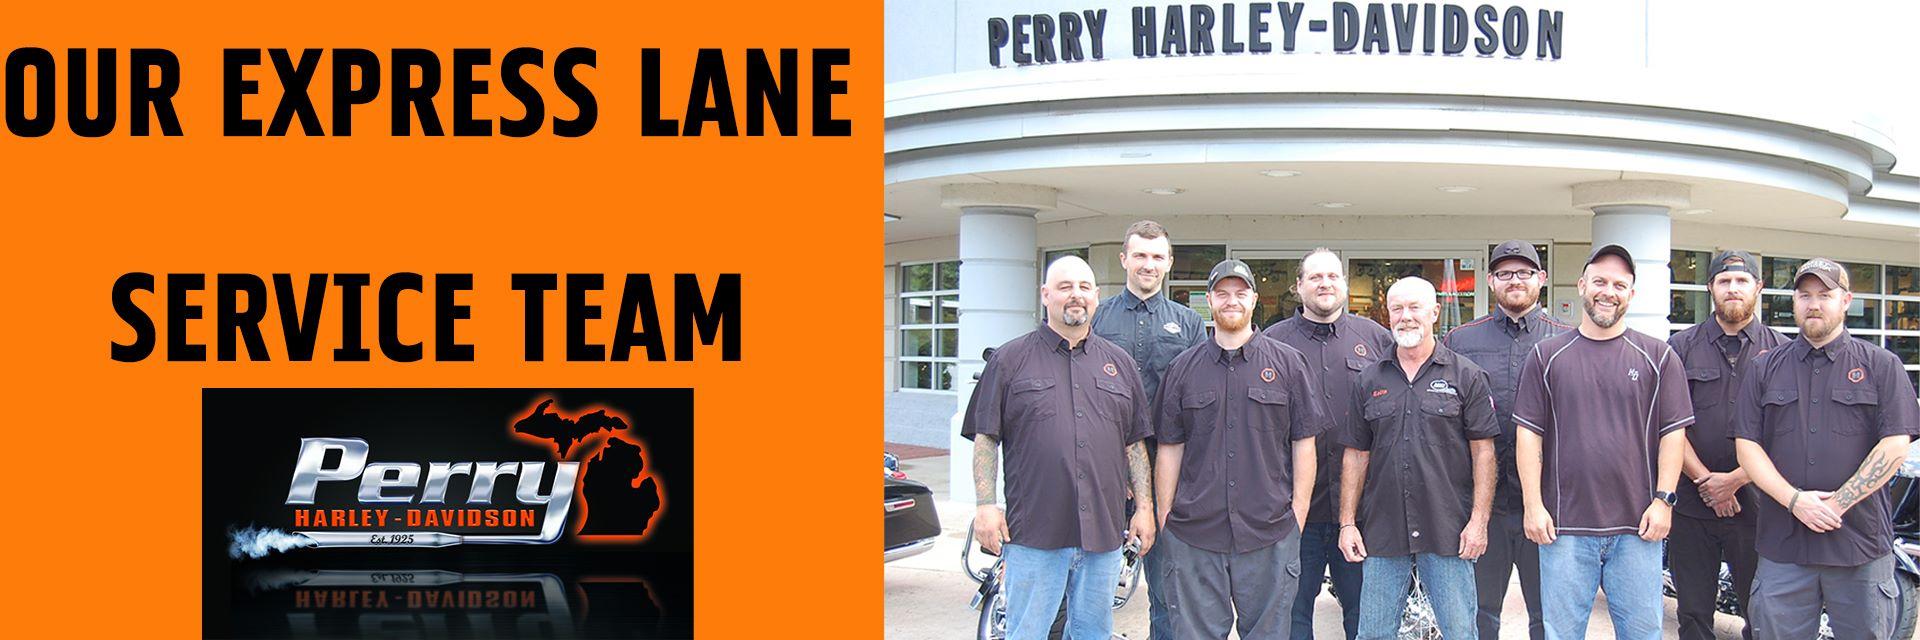 Perry Harley-Davidson: Motorcycle Dealers, Kalamazoo -Battle